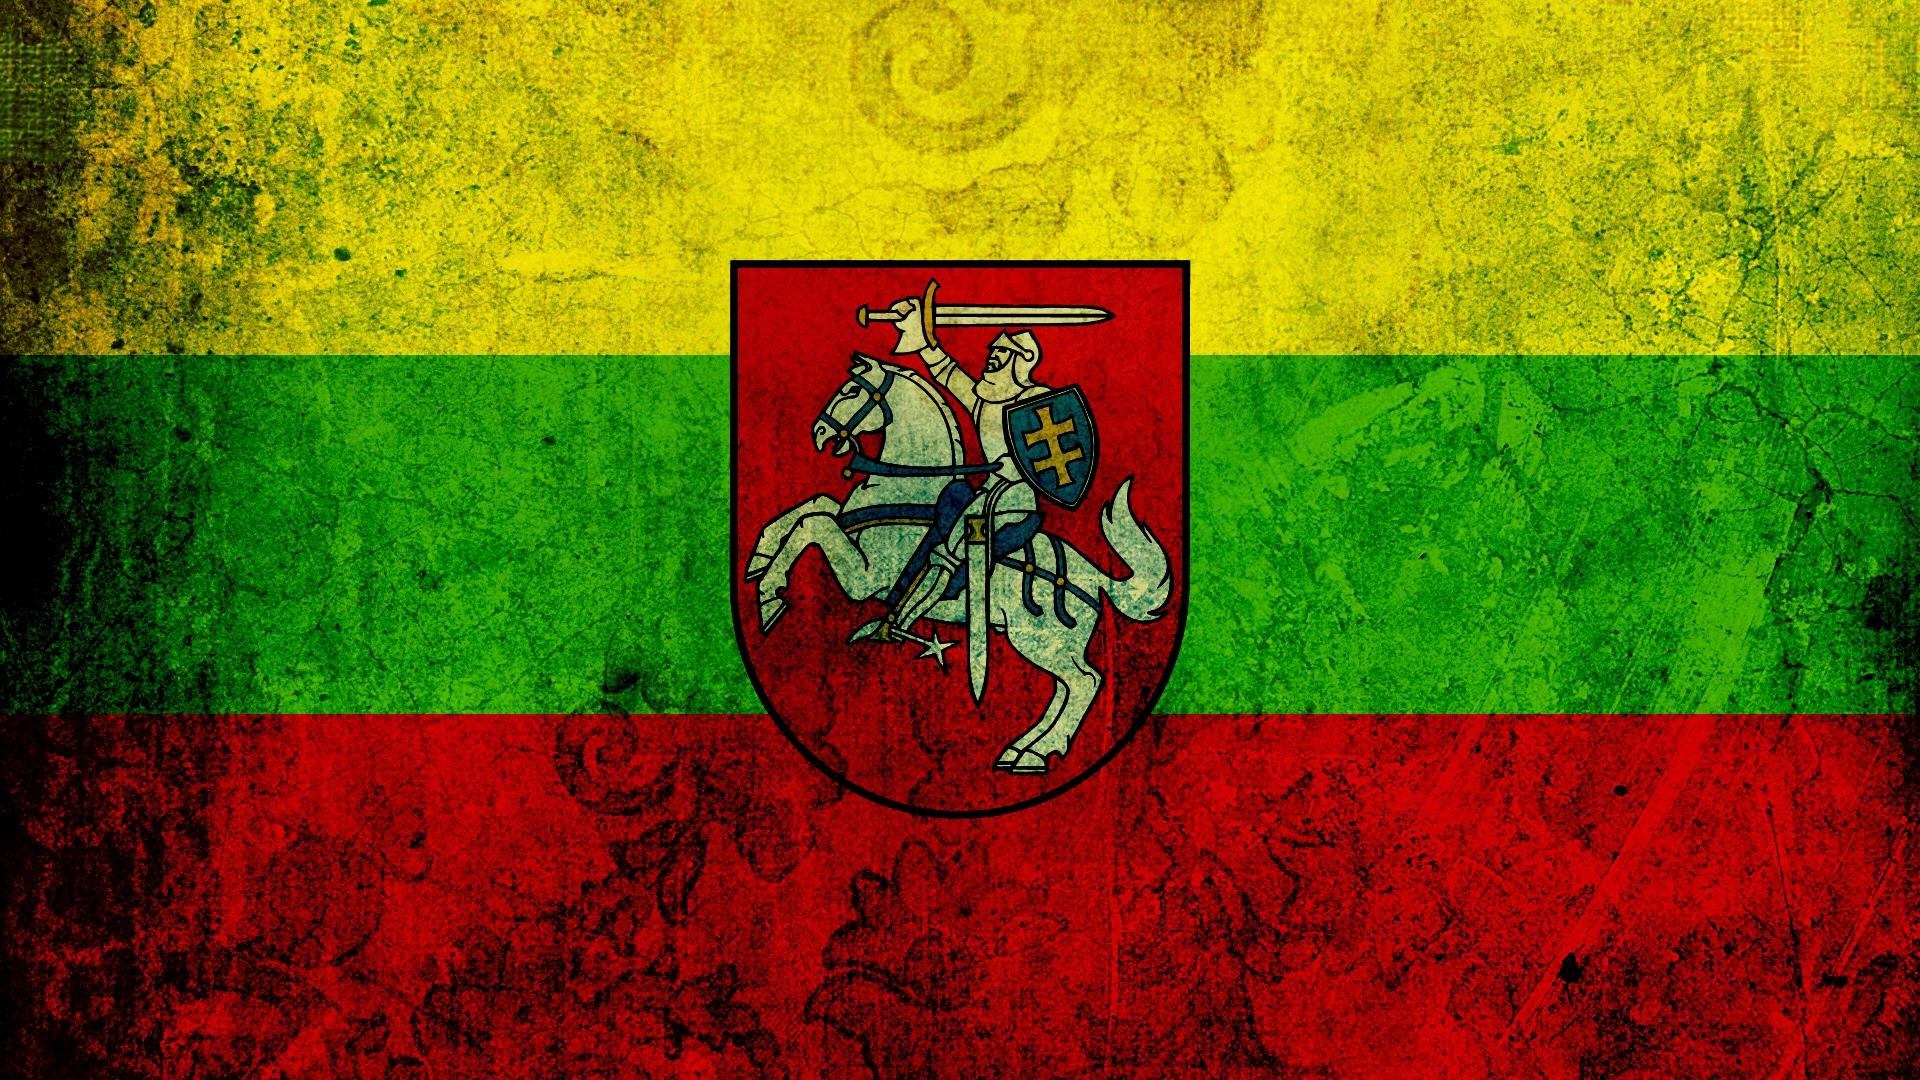 Lithuania Flag Texture Background Symbols   Stock Photos 1920x1080